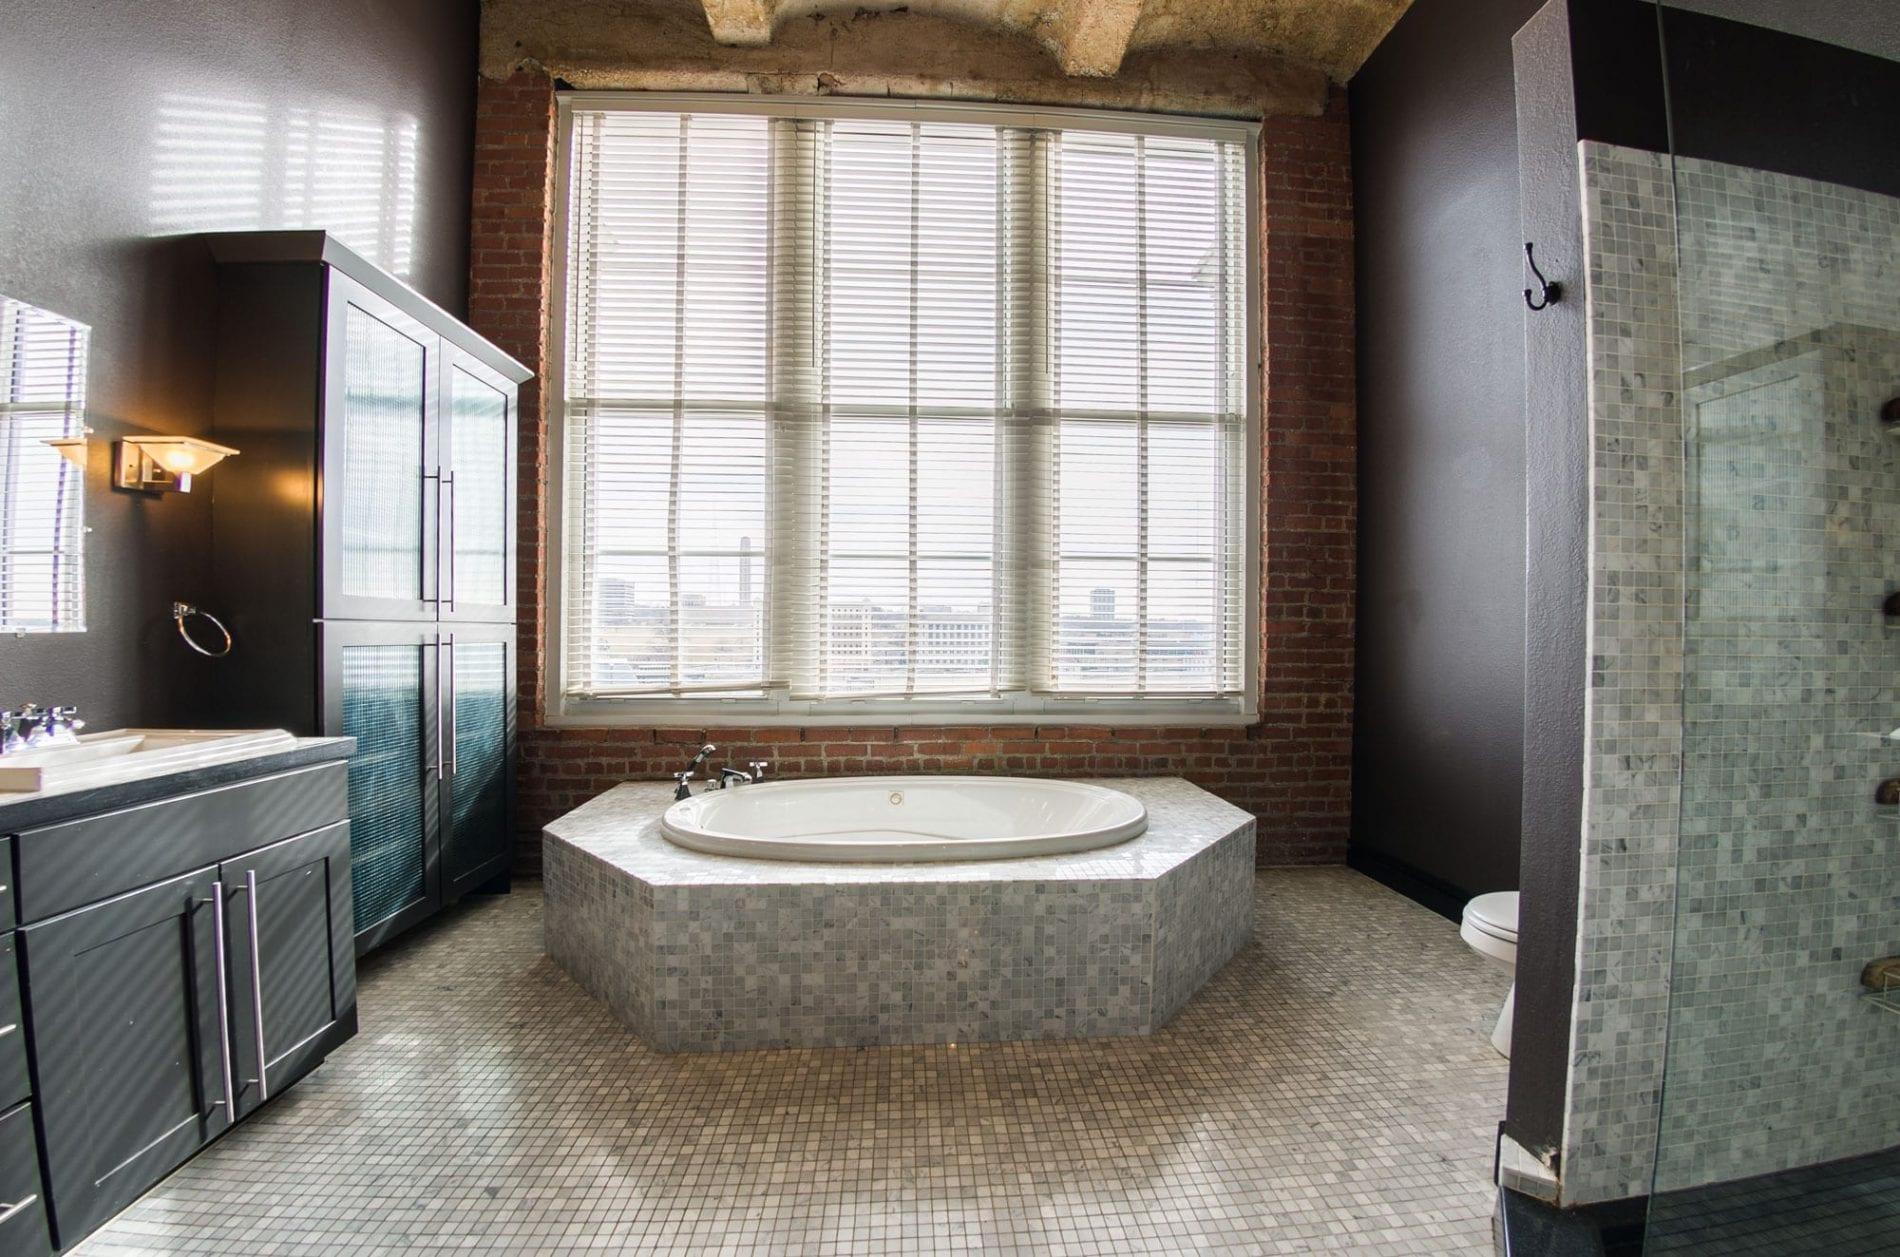 Studio Apartment Kansas City featured for rent - stuart hall #609 - kansas city lofts, condos